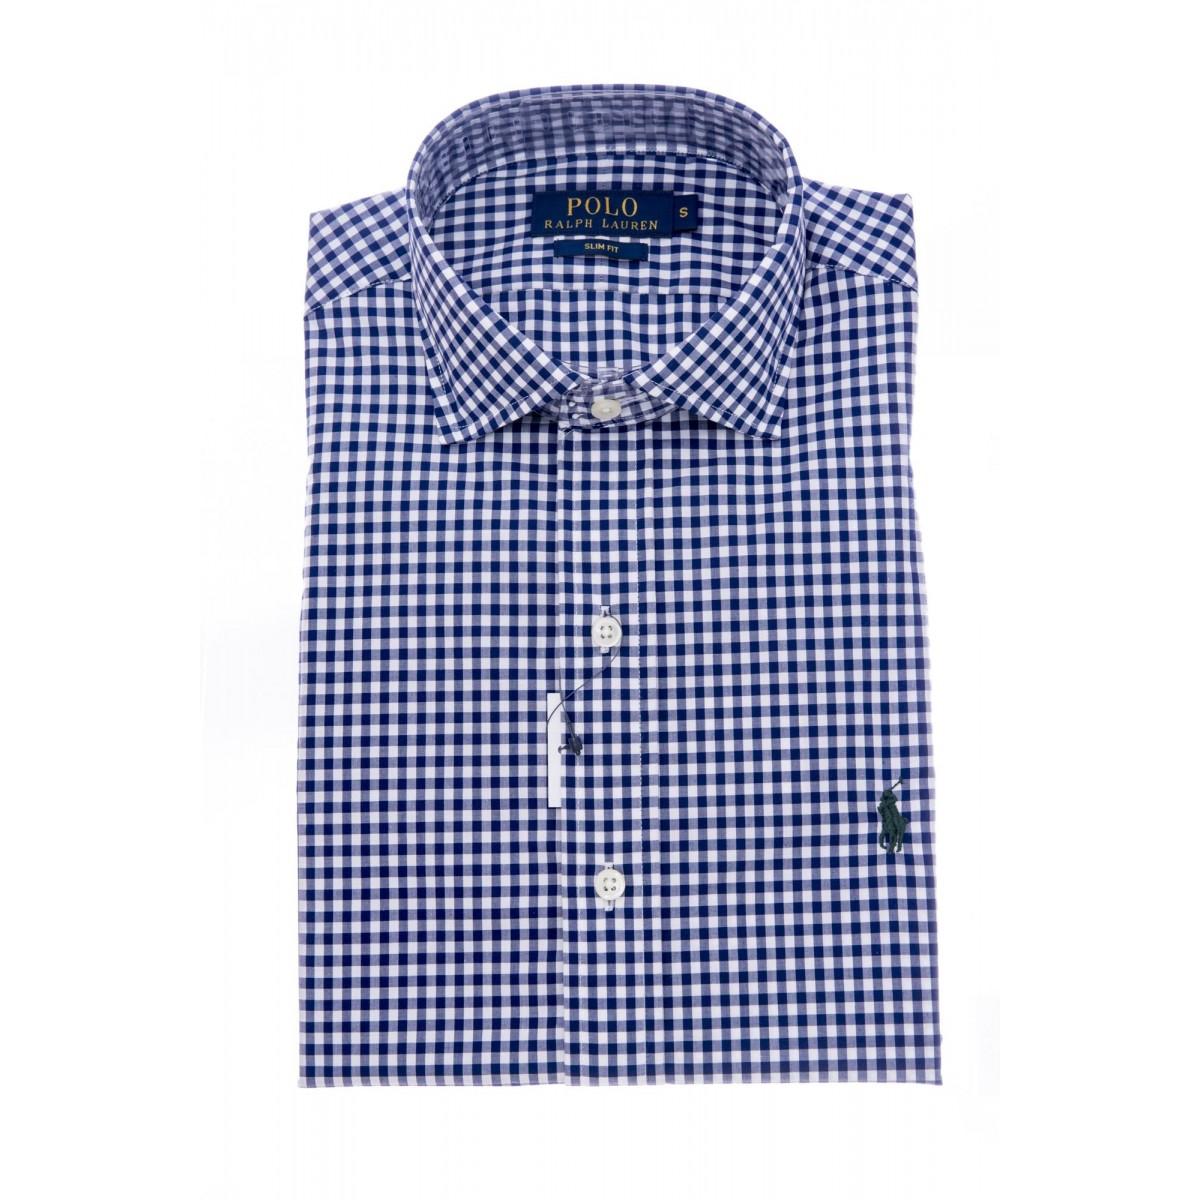 Camicia uomo Ralph lauren - A04w37crc55ak slim